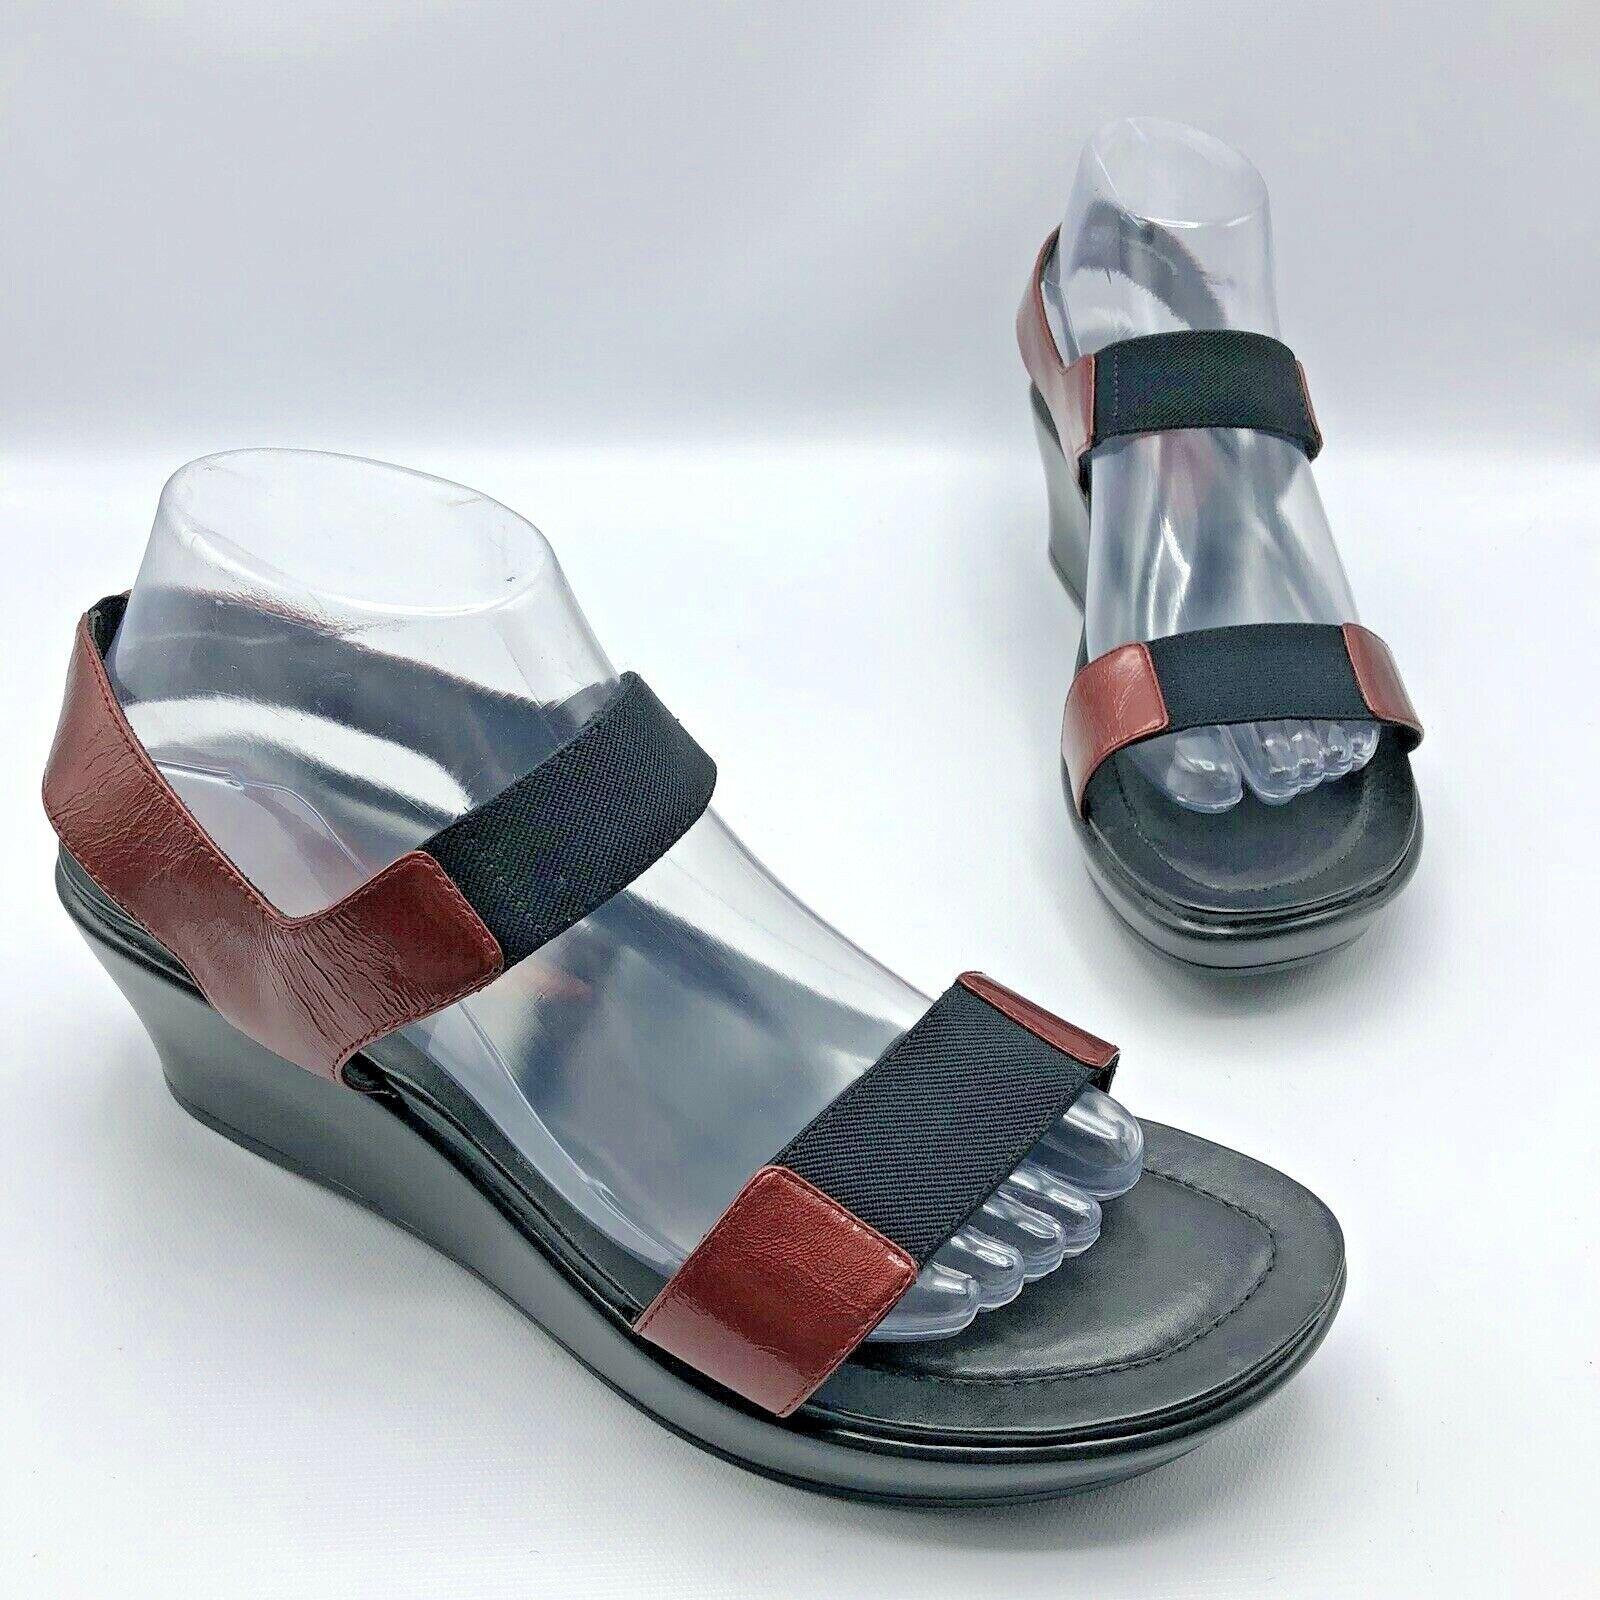 Dansko 1203380200 mujer rojo Patent Leather Elastic Sandal zapatos SZ 9.5-10 EUR 40